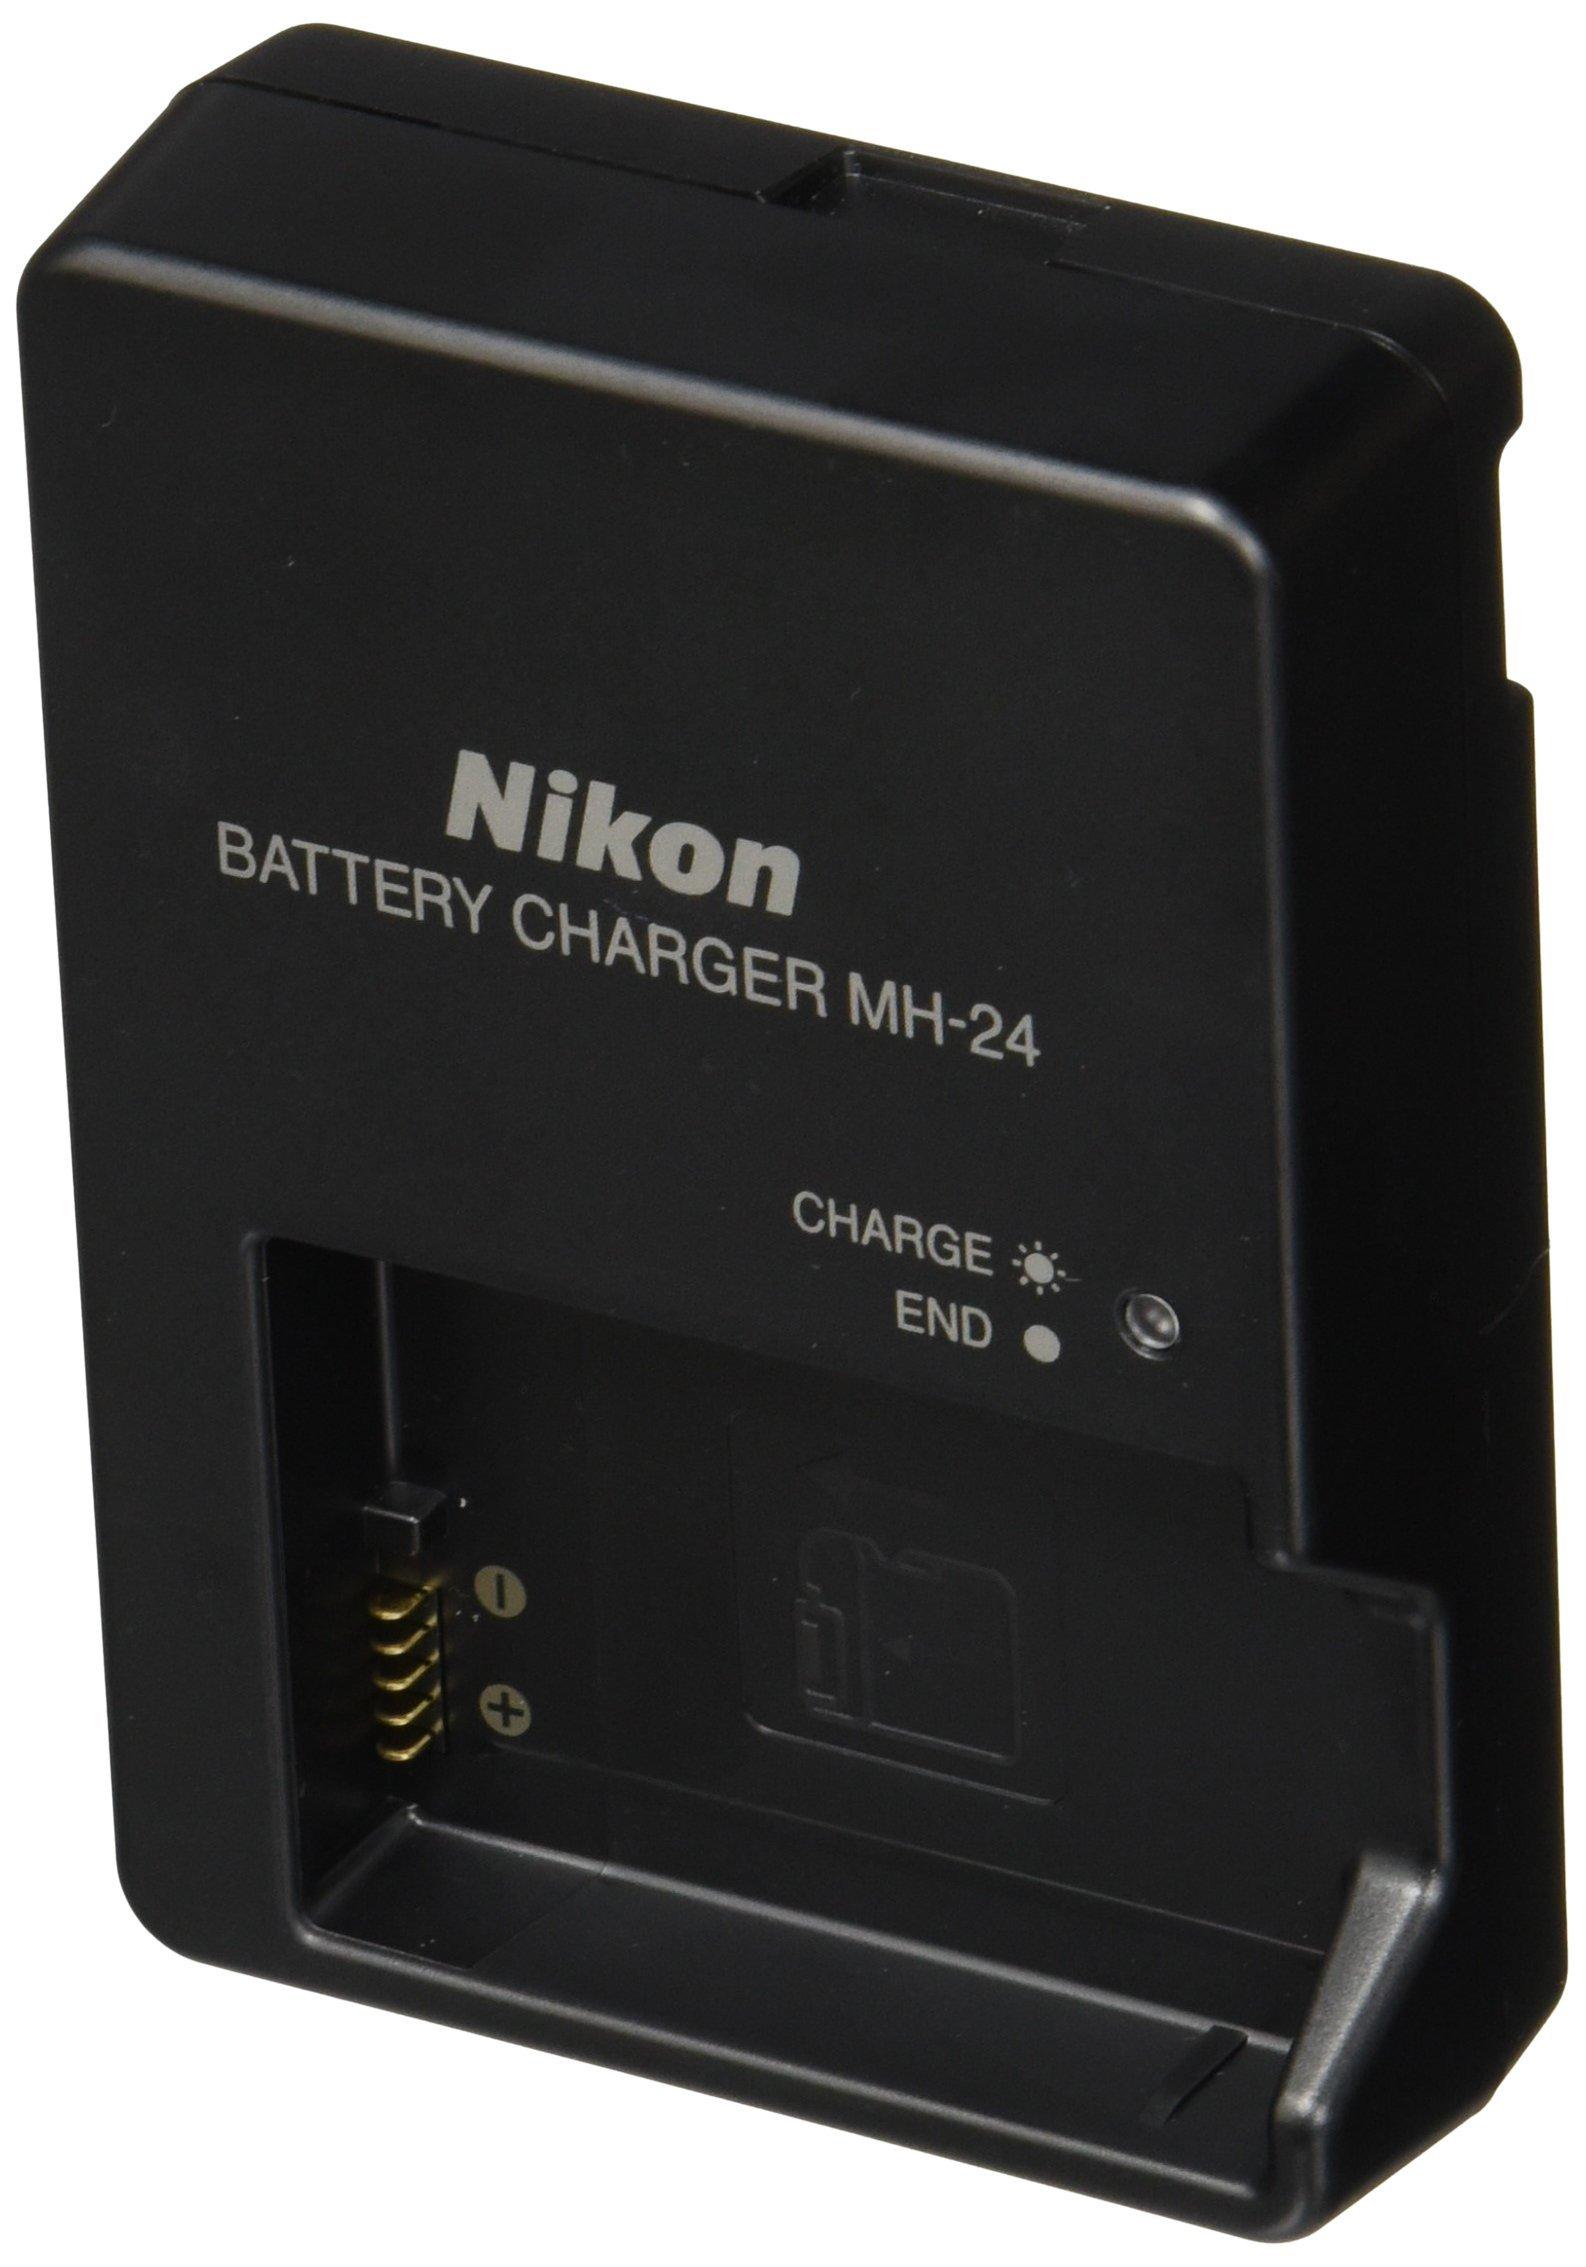 Nikon MH-24 Quick Charger for EN-EL14 Li-ion Battery compatible with Nikon D3100 DSLR, D5100 DSLR, and P7000 Digital Cameras by Nikon